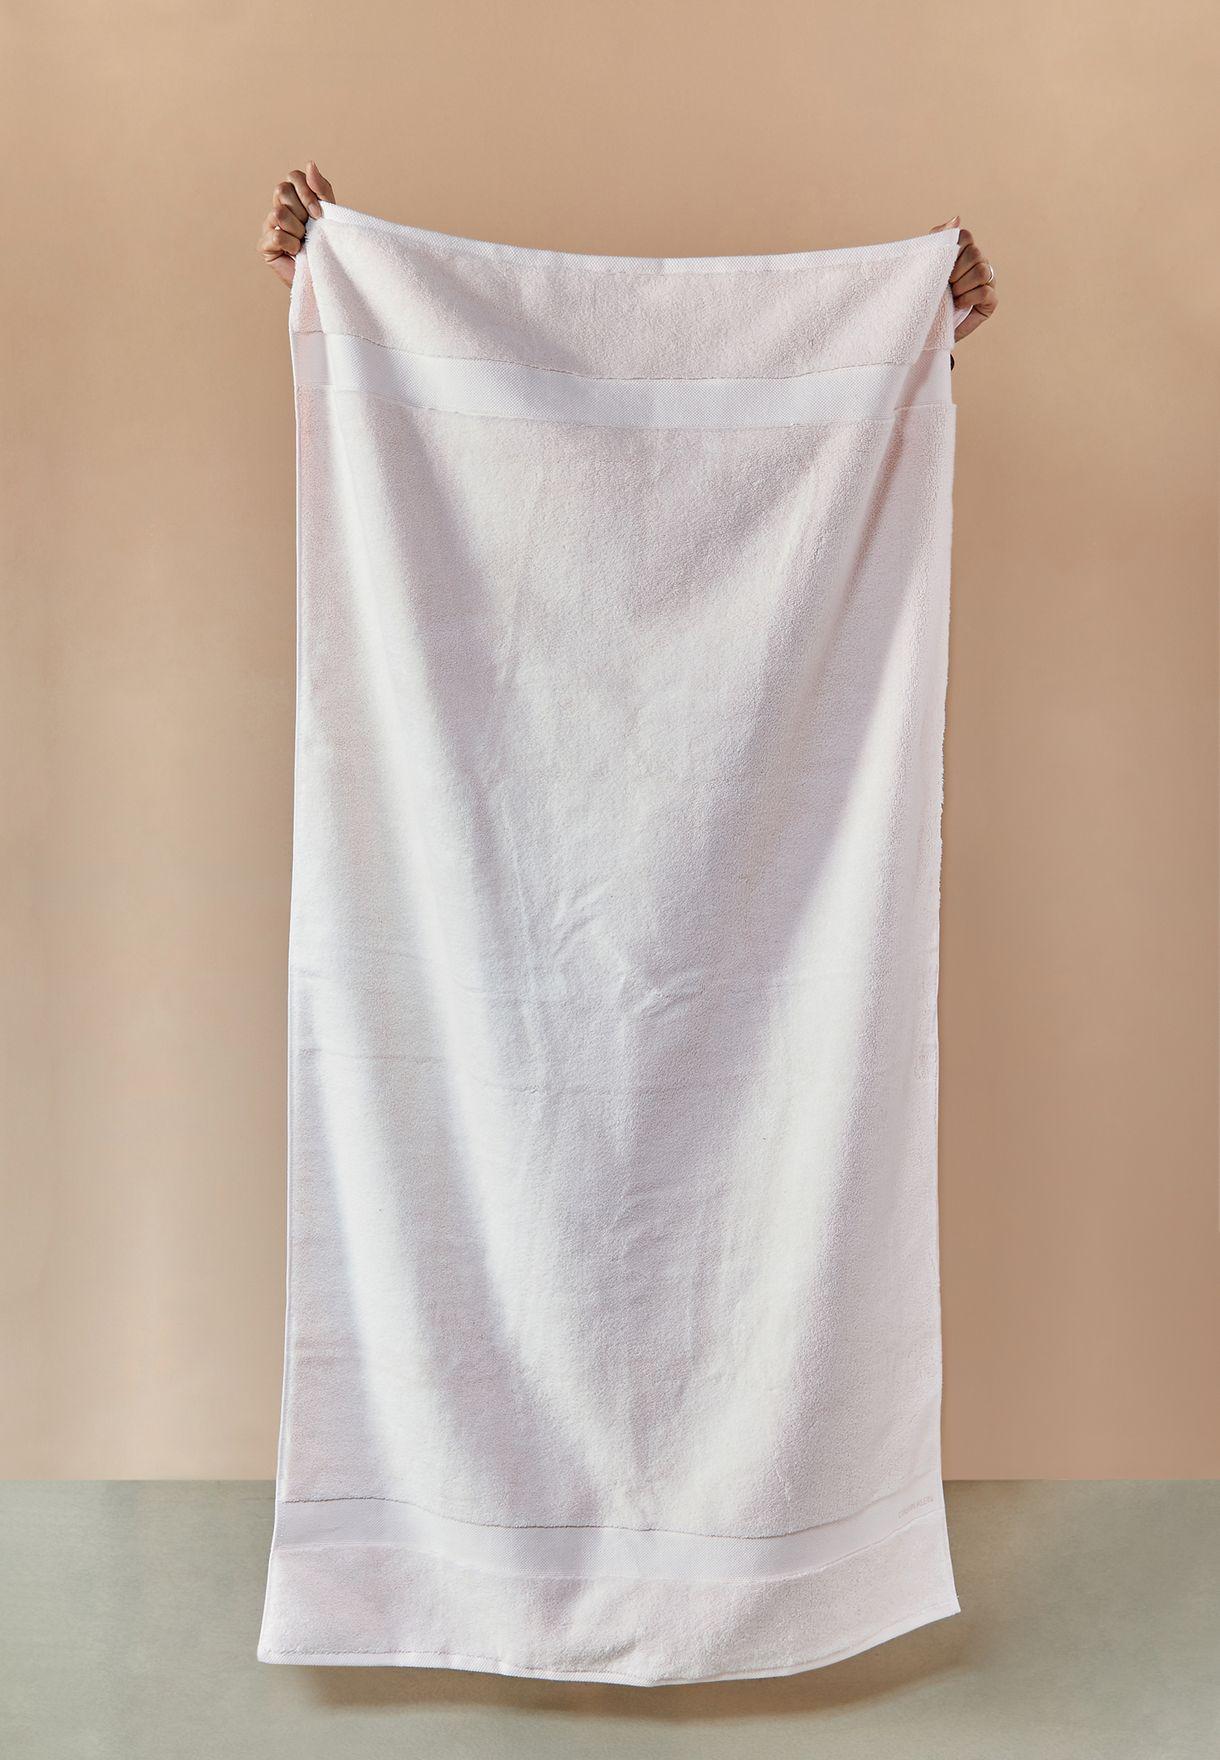 Bath Towel 76 x 142 cm